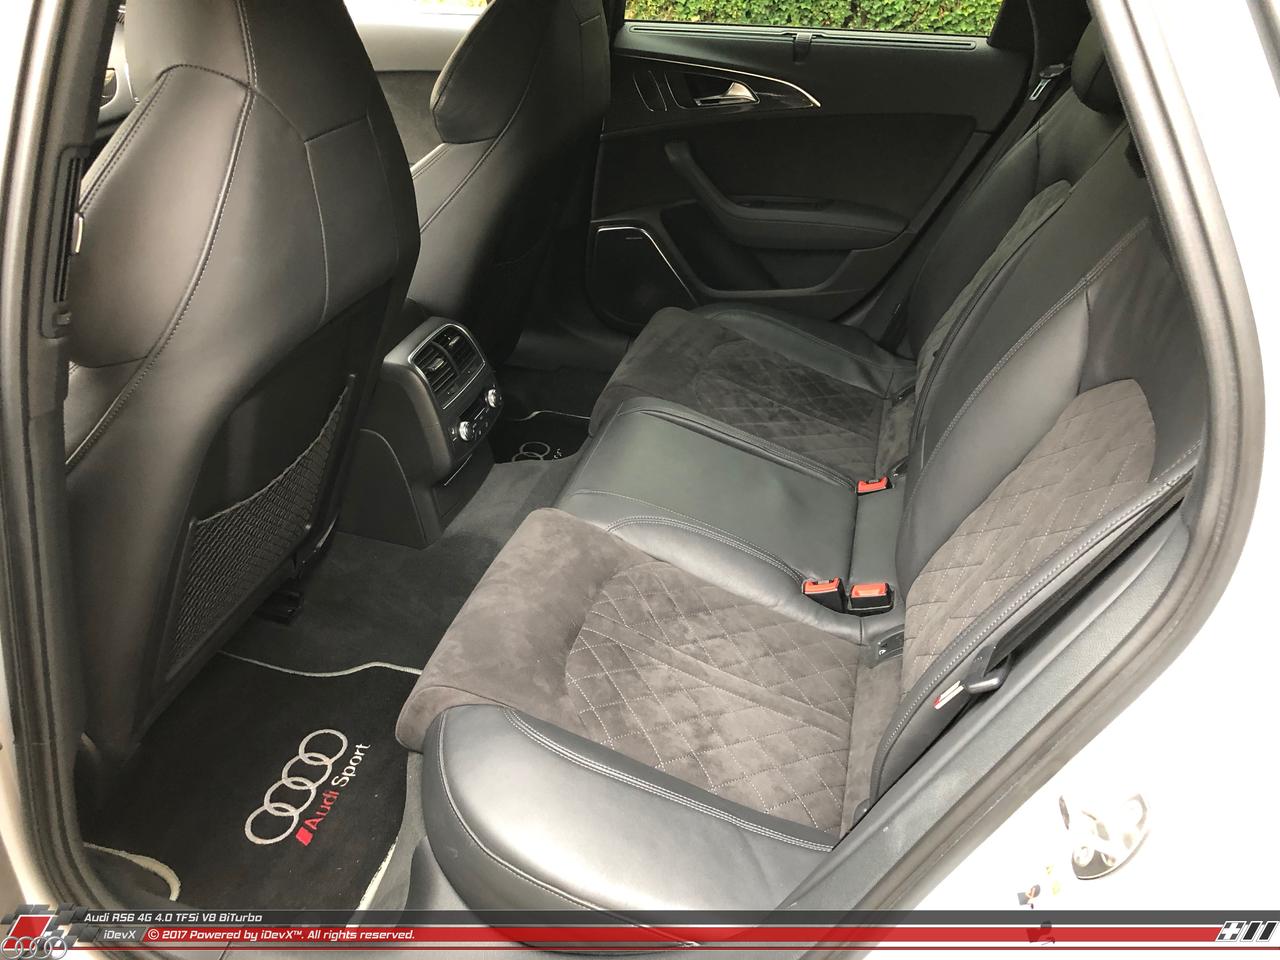 10_11.2018_Audi-RS6_iDevX_004.png